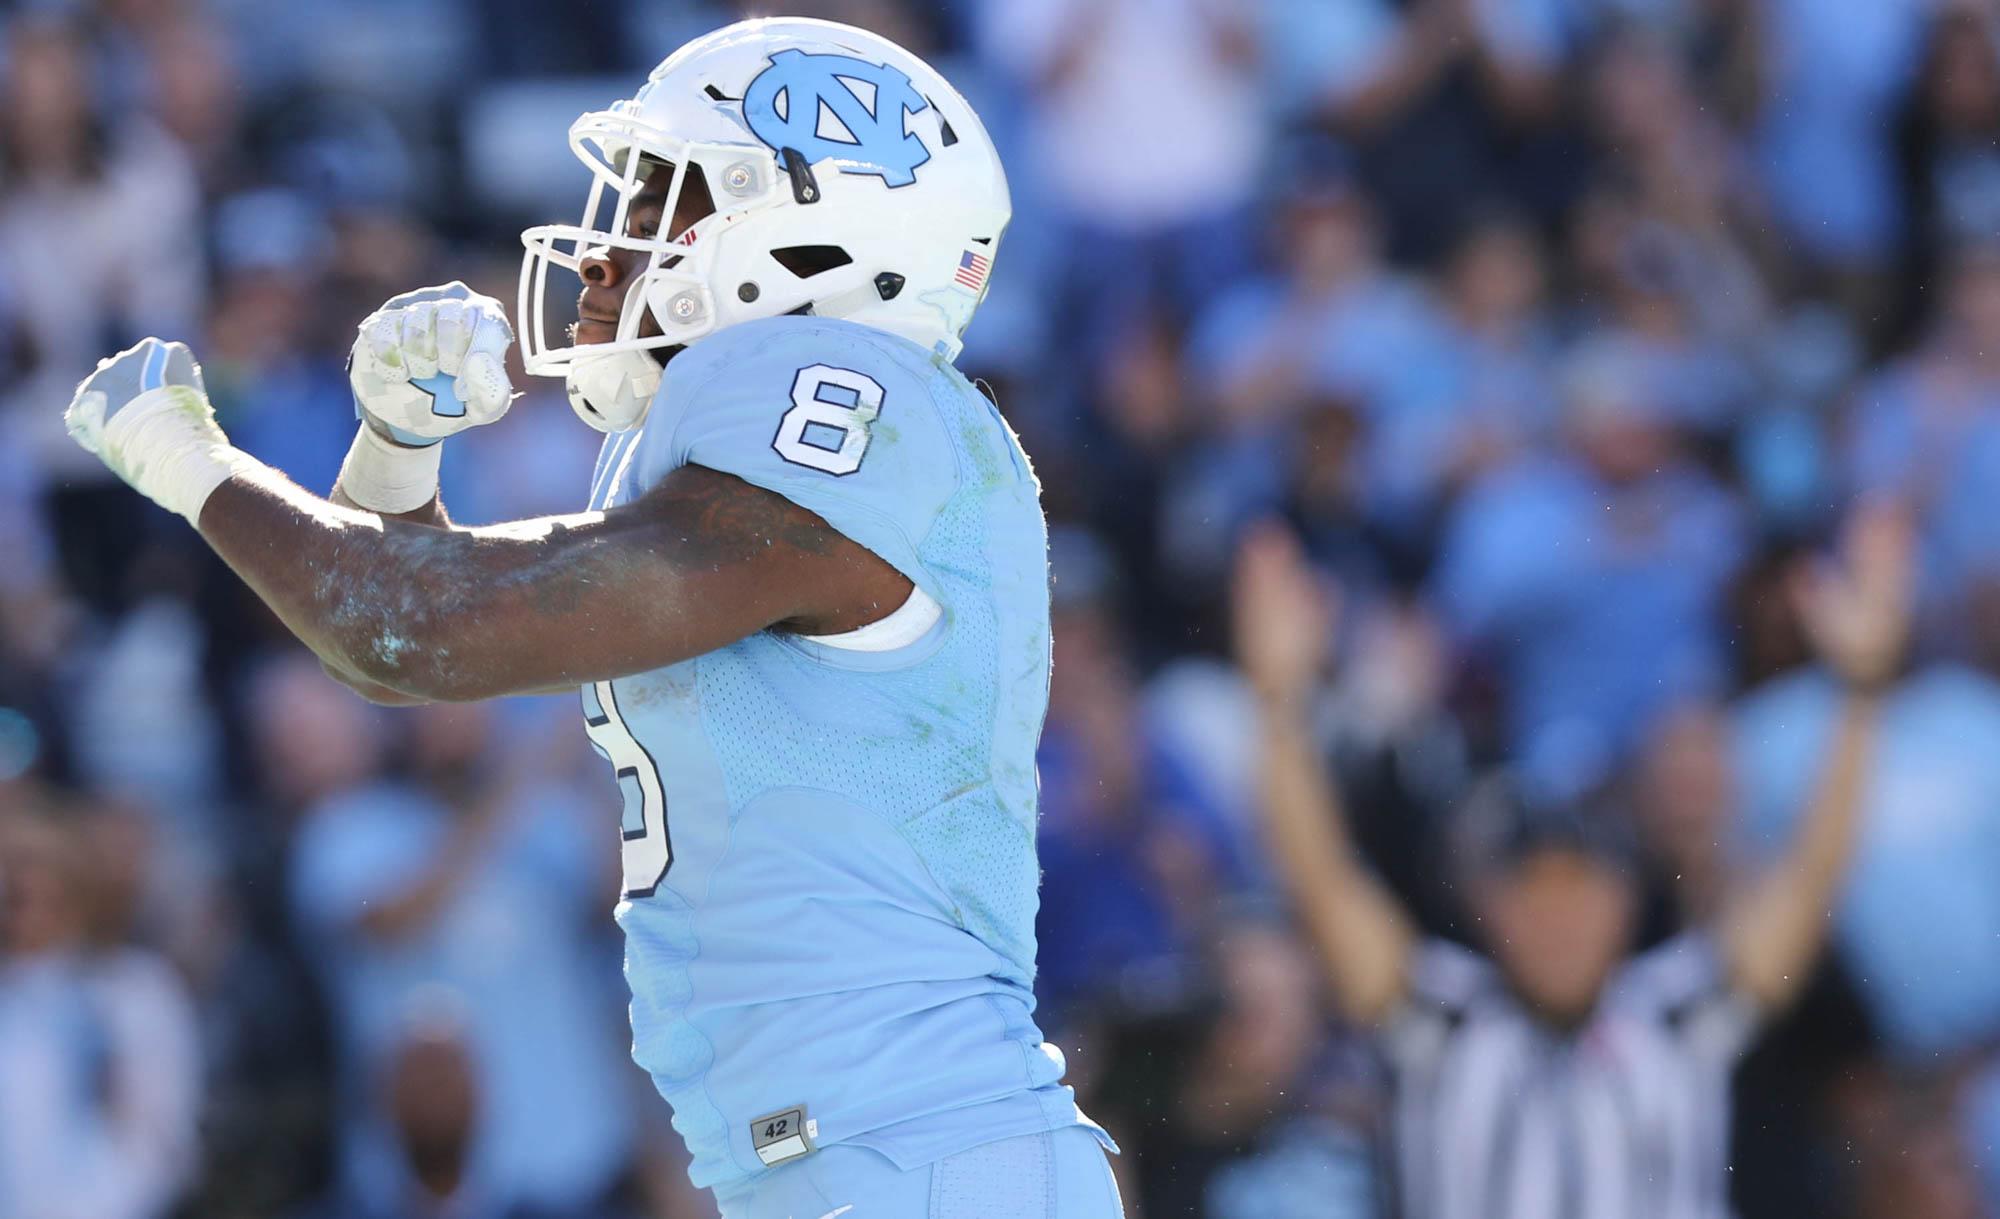 North Carolina Tar Heels tailback T.J. Logan (8) celebrates after a touchdown against the Georgia Tech Yellow Jackets at Kenan Stadium at Chapel Hill, NC on Saturday Nov. 5, 2016.